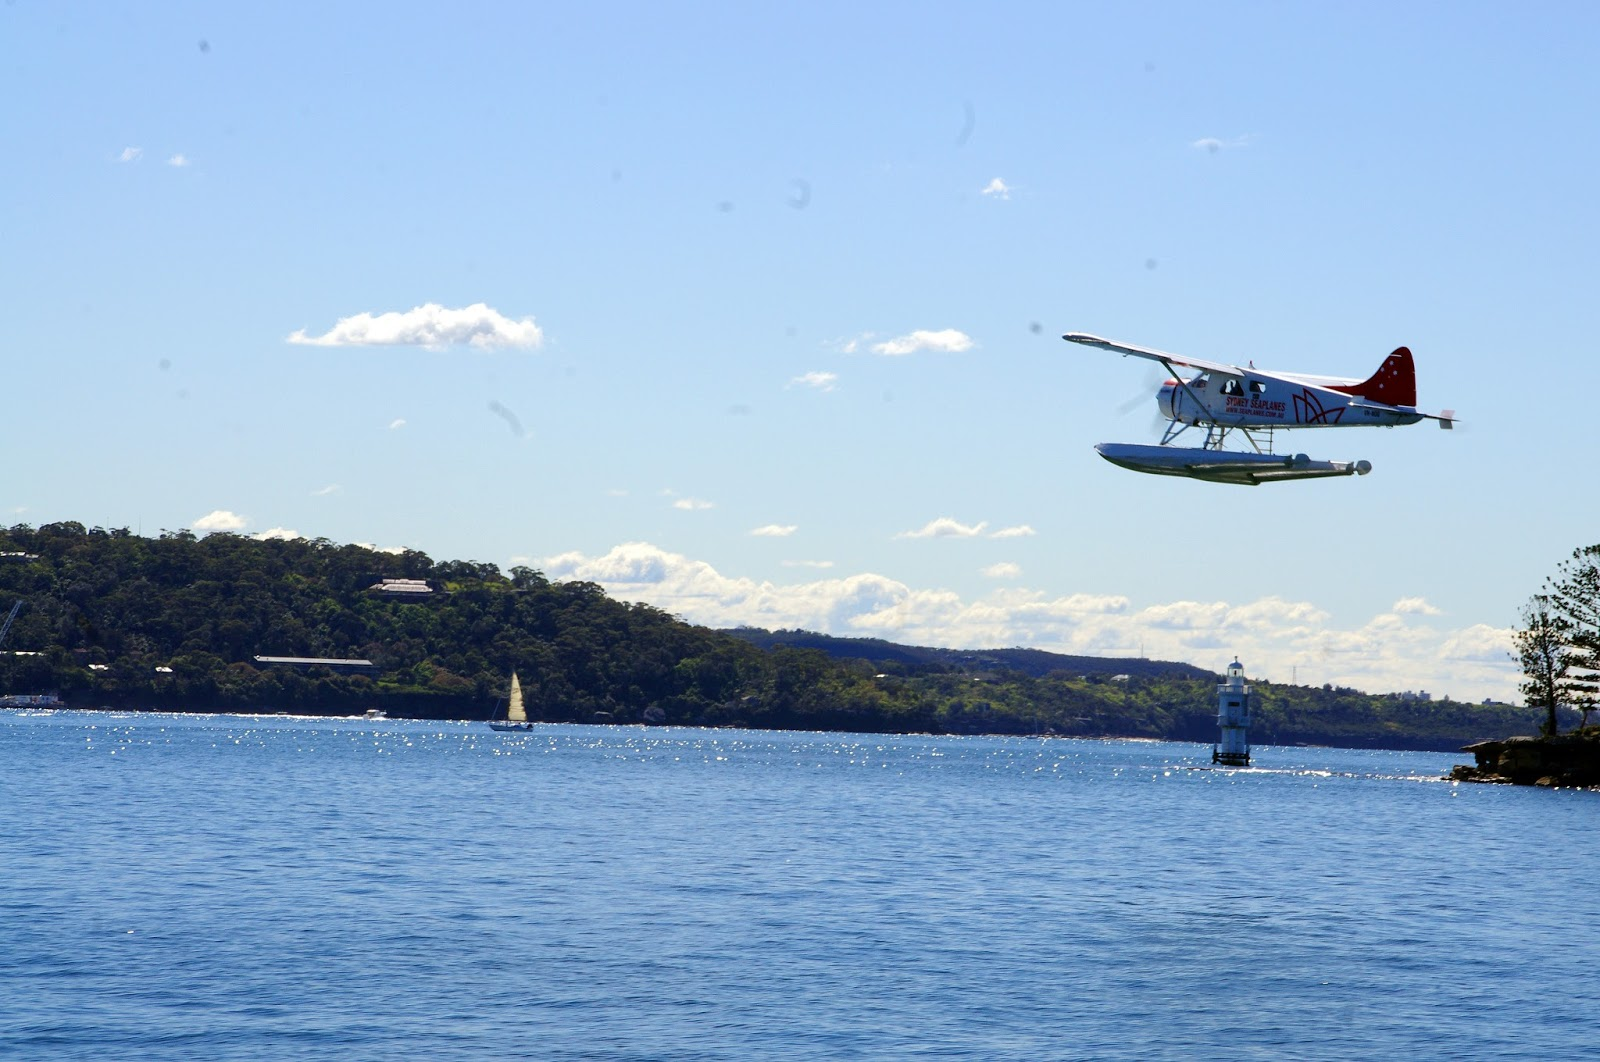 Sea plane taking off in Sydney harbour